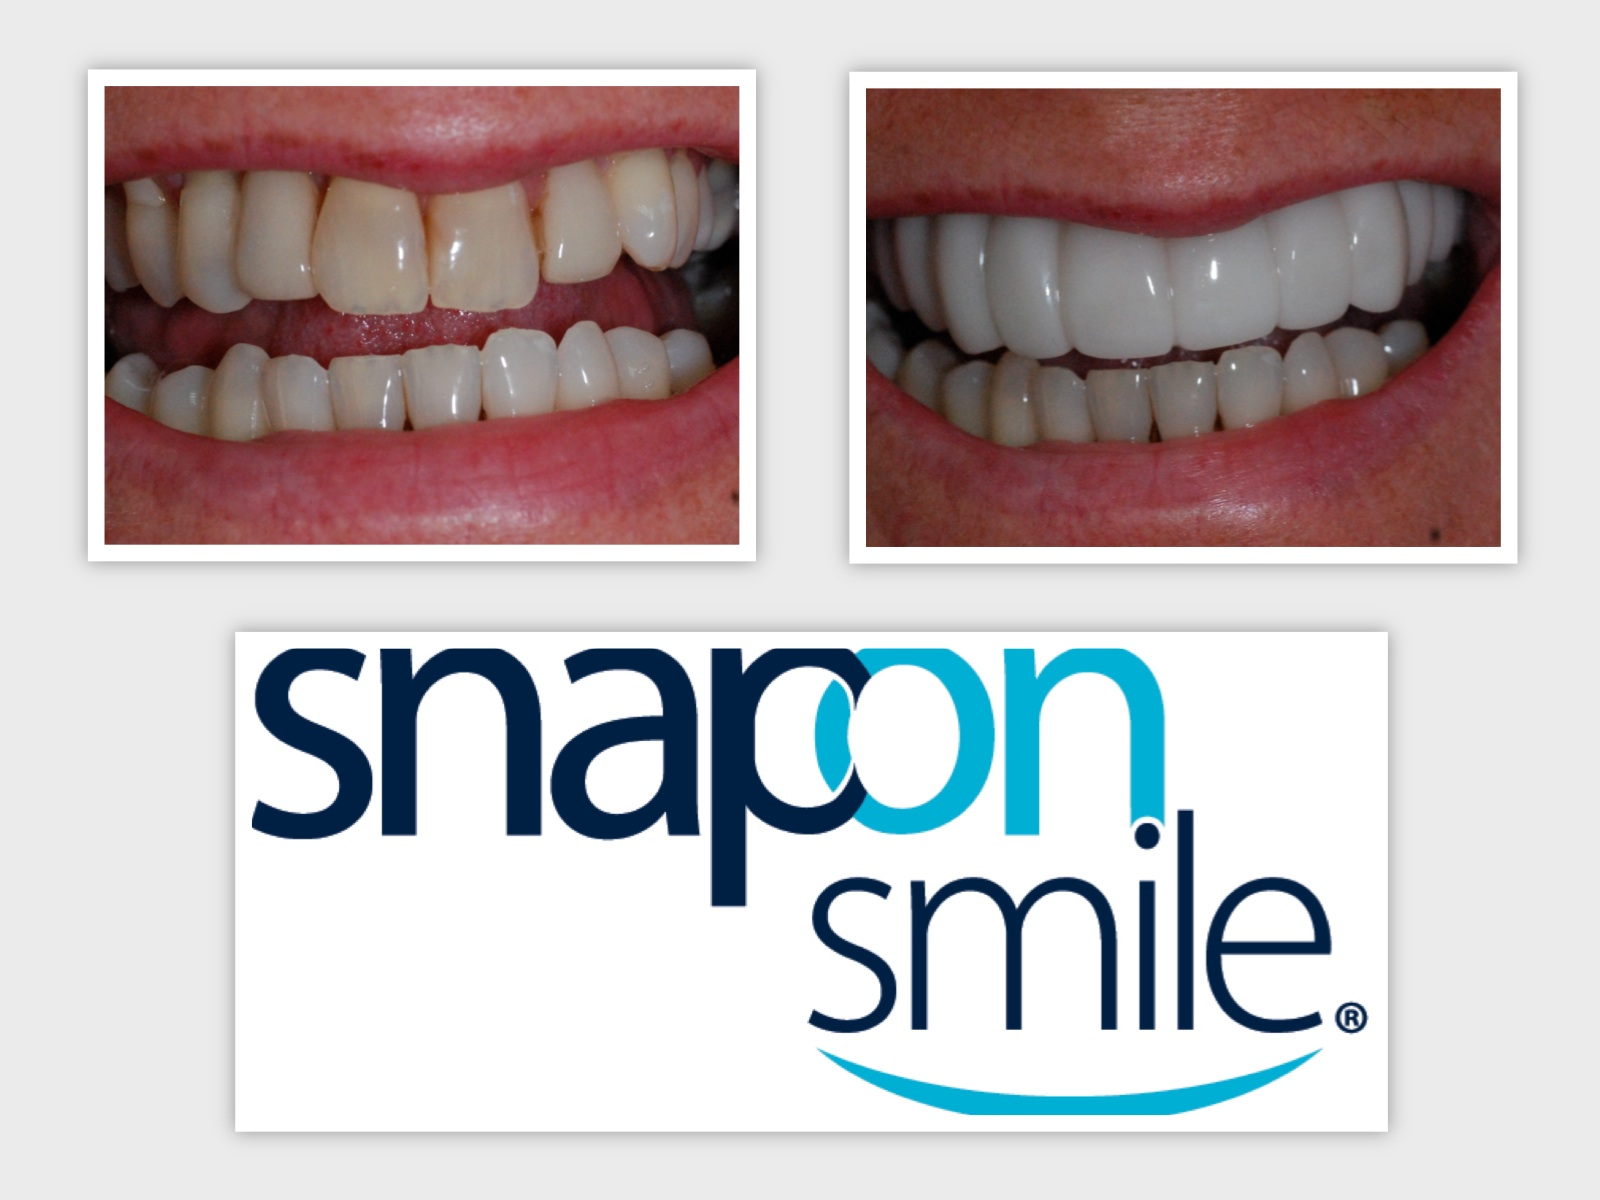 Arab dental clinic - 3 5